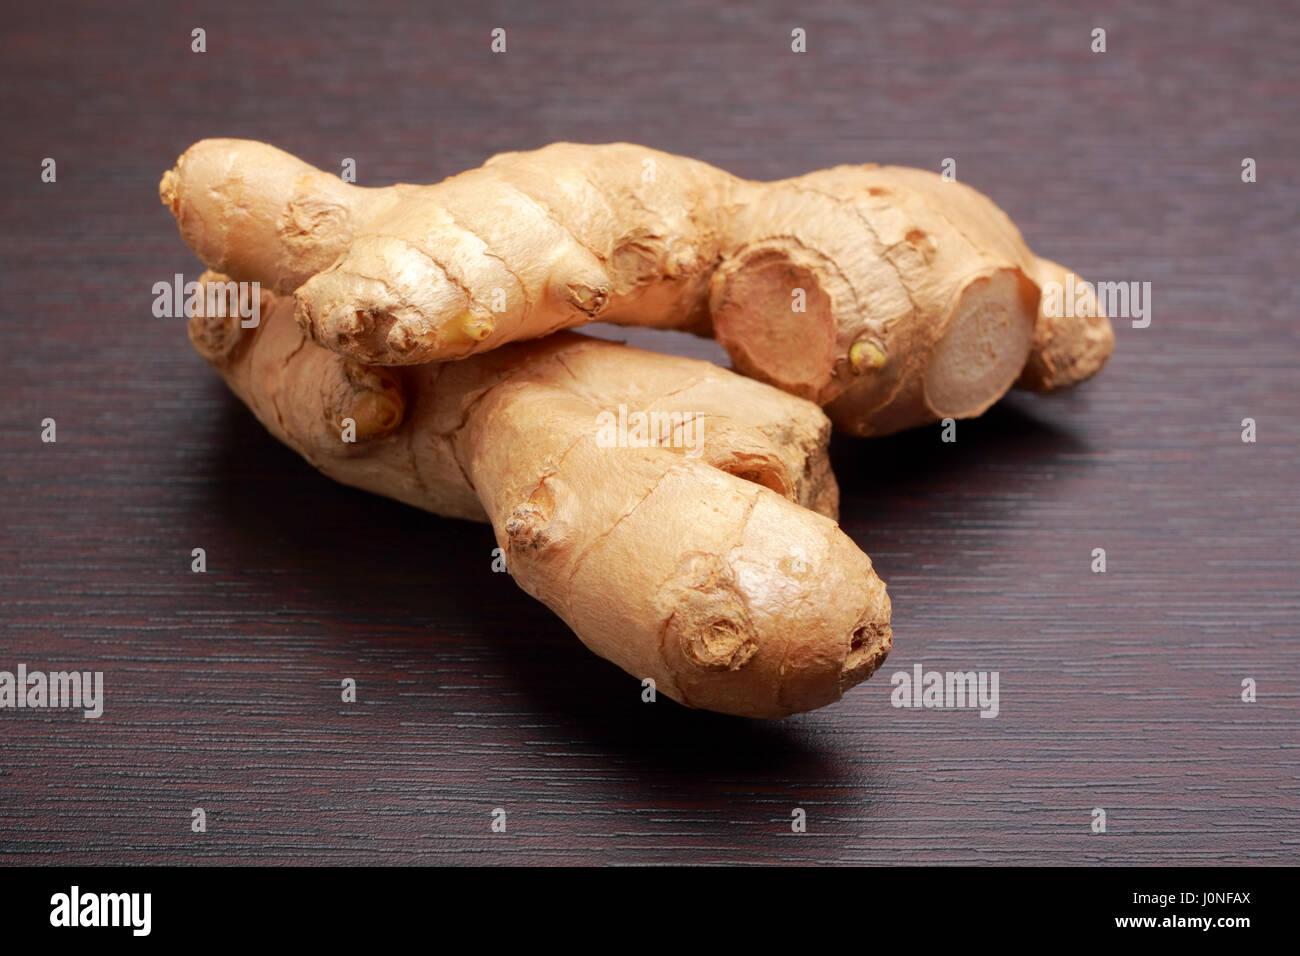 Ginger root (rhizome) lying on dark board - Stock Image